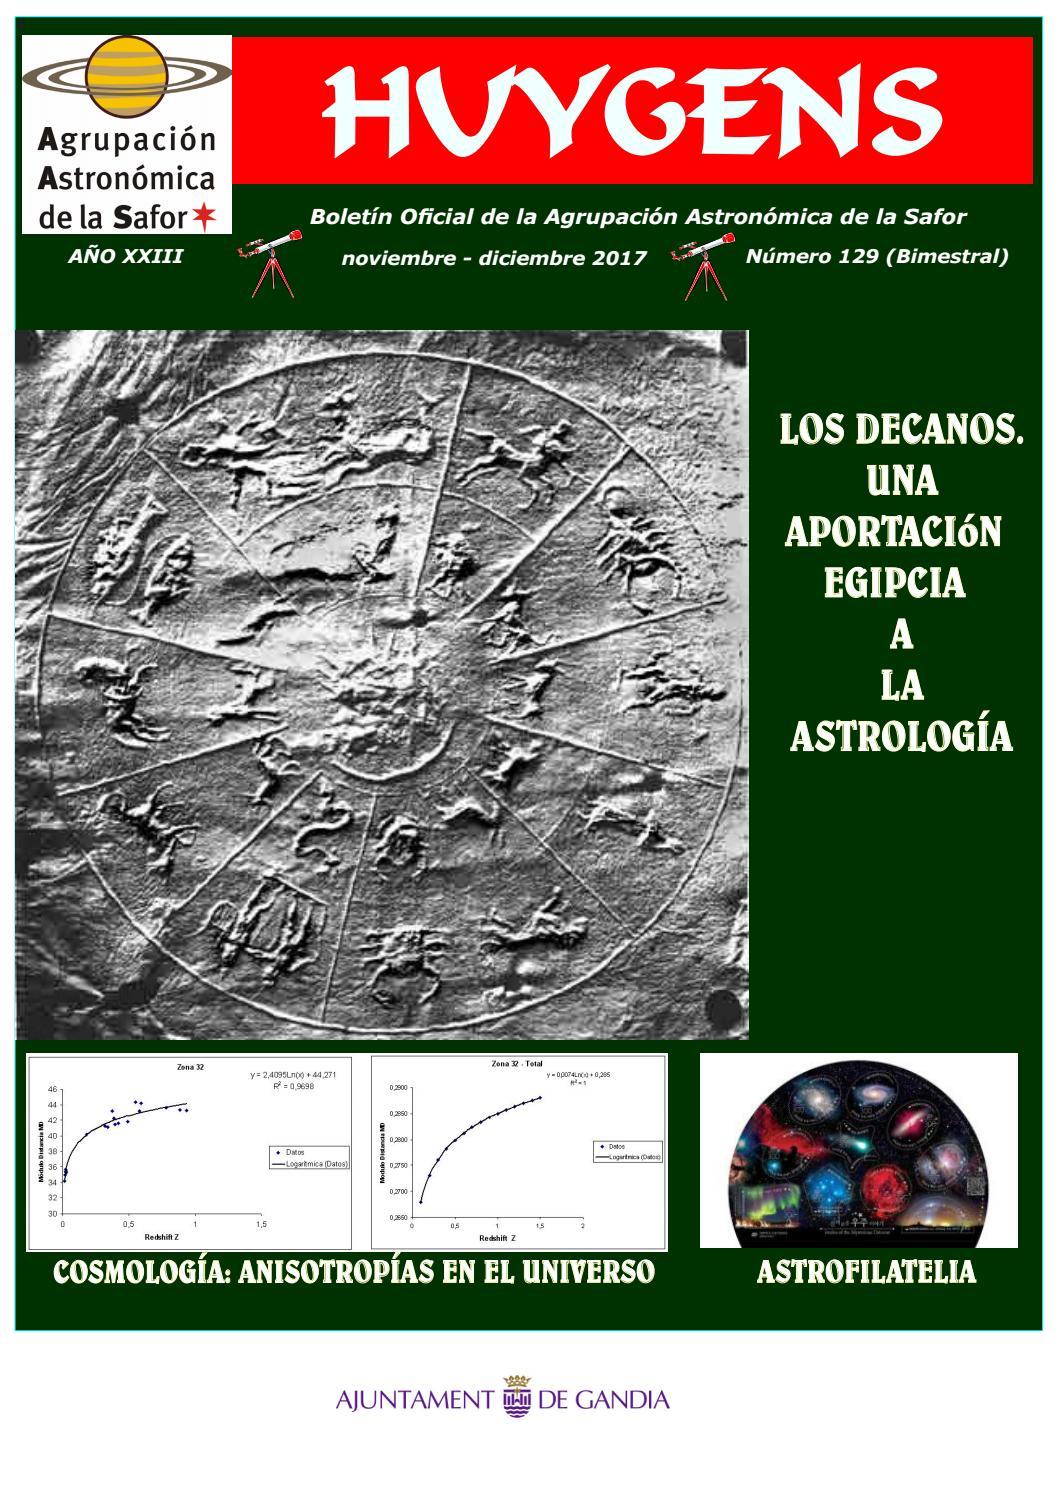 Huygens 129 by Agrupacion Astronómica de la Safor - issuu